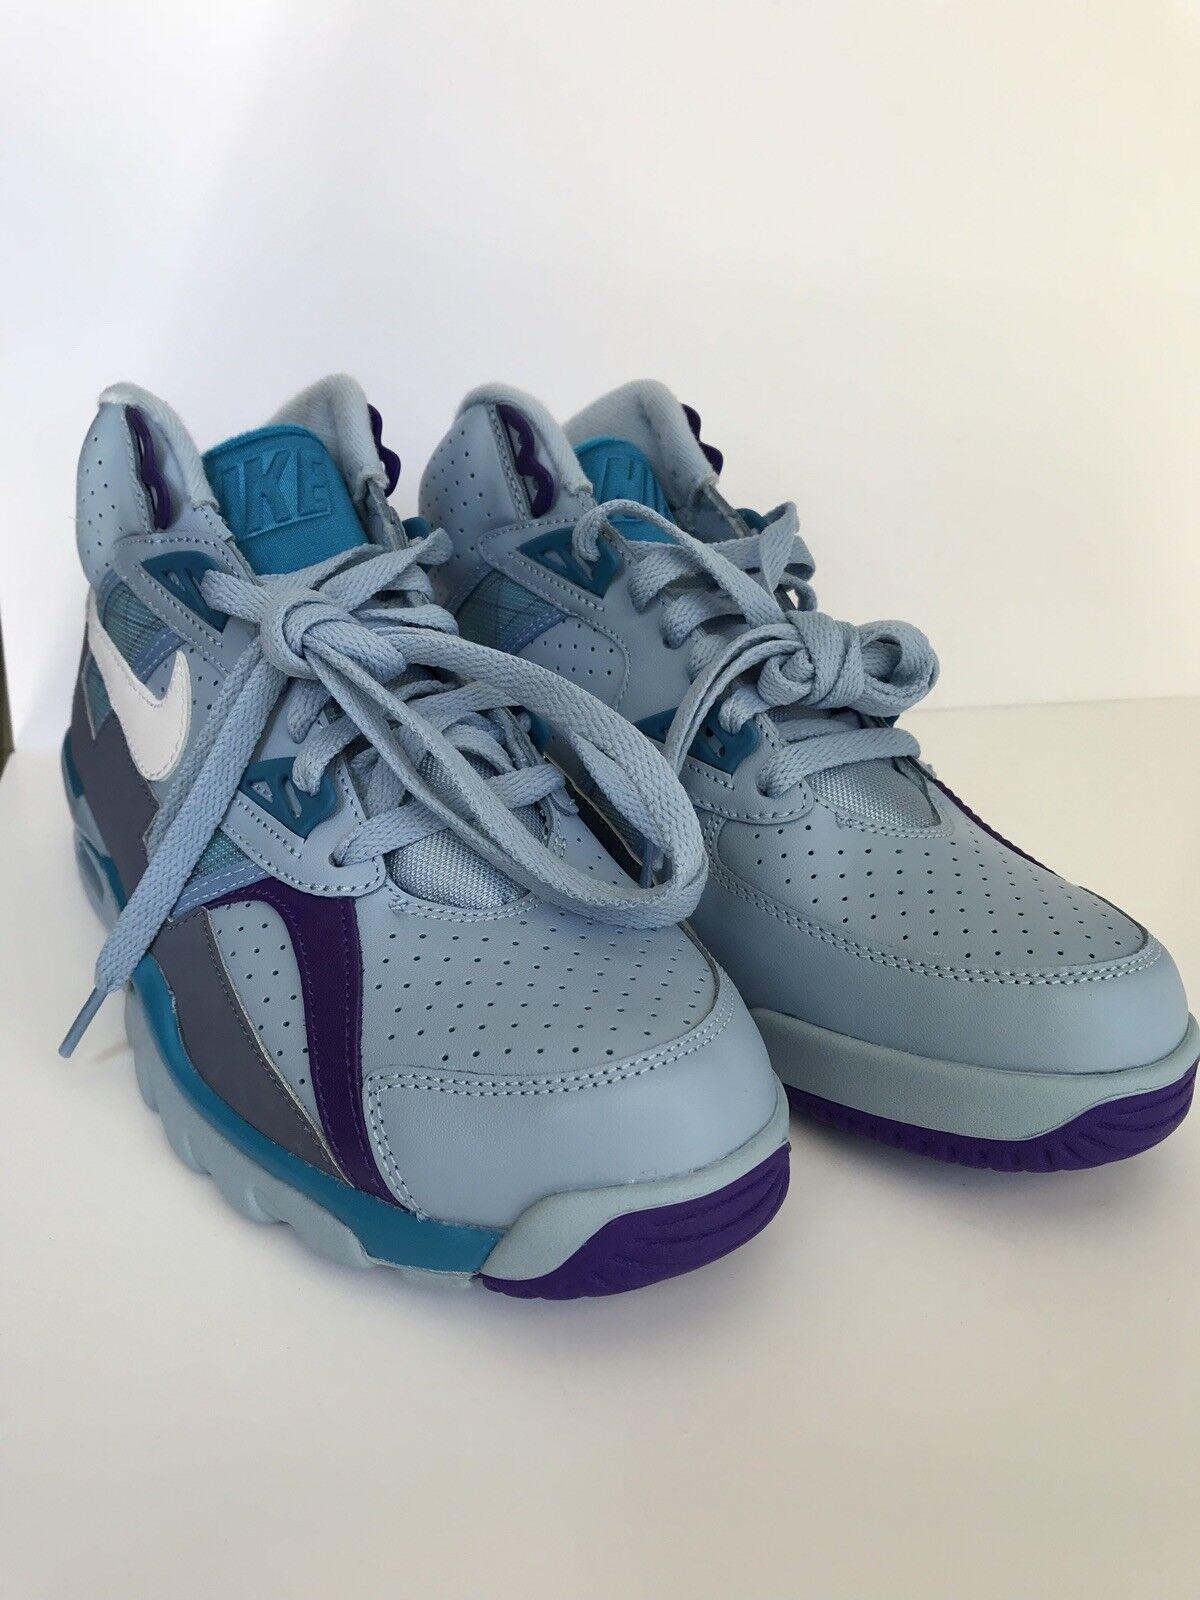 Nike air trainer sc bo jackson blu, bianco e turquiose scorpe 7,5